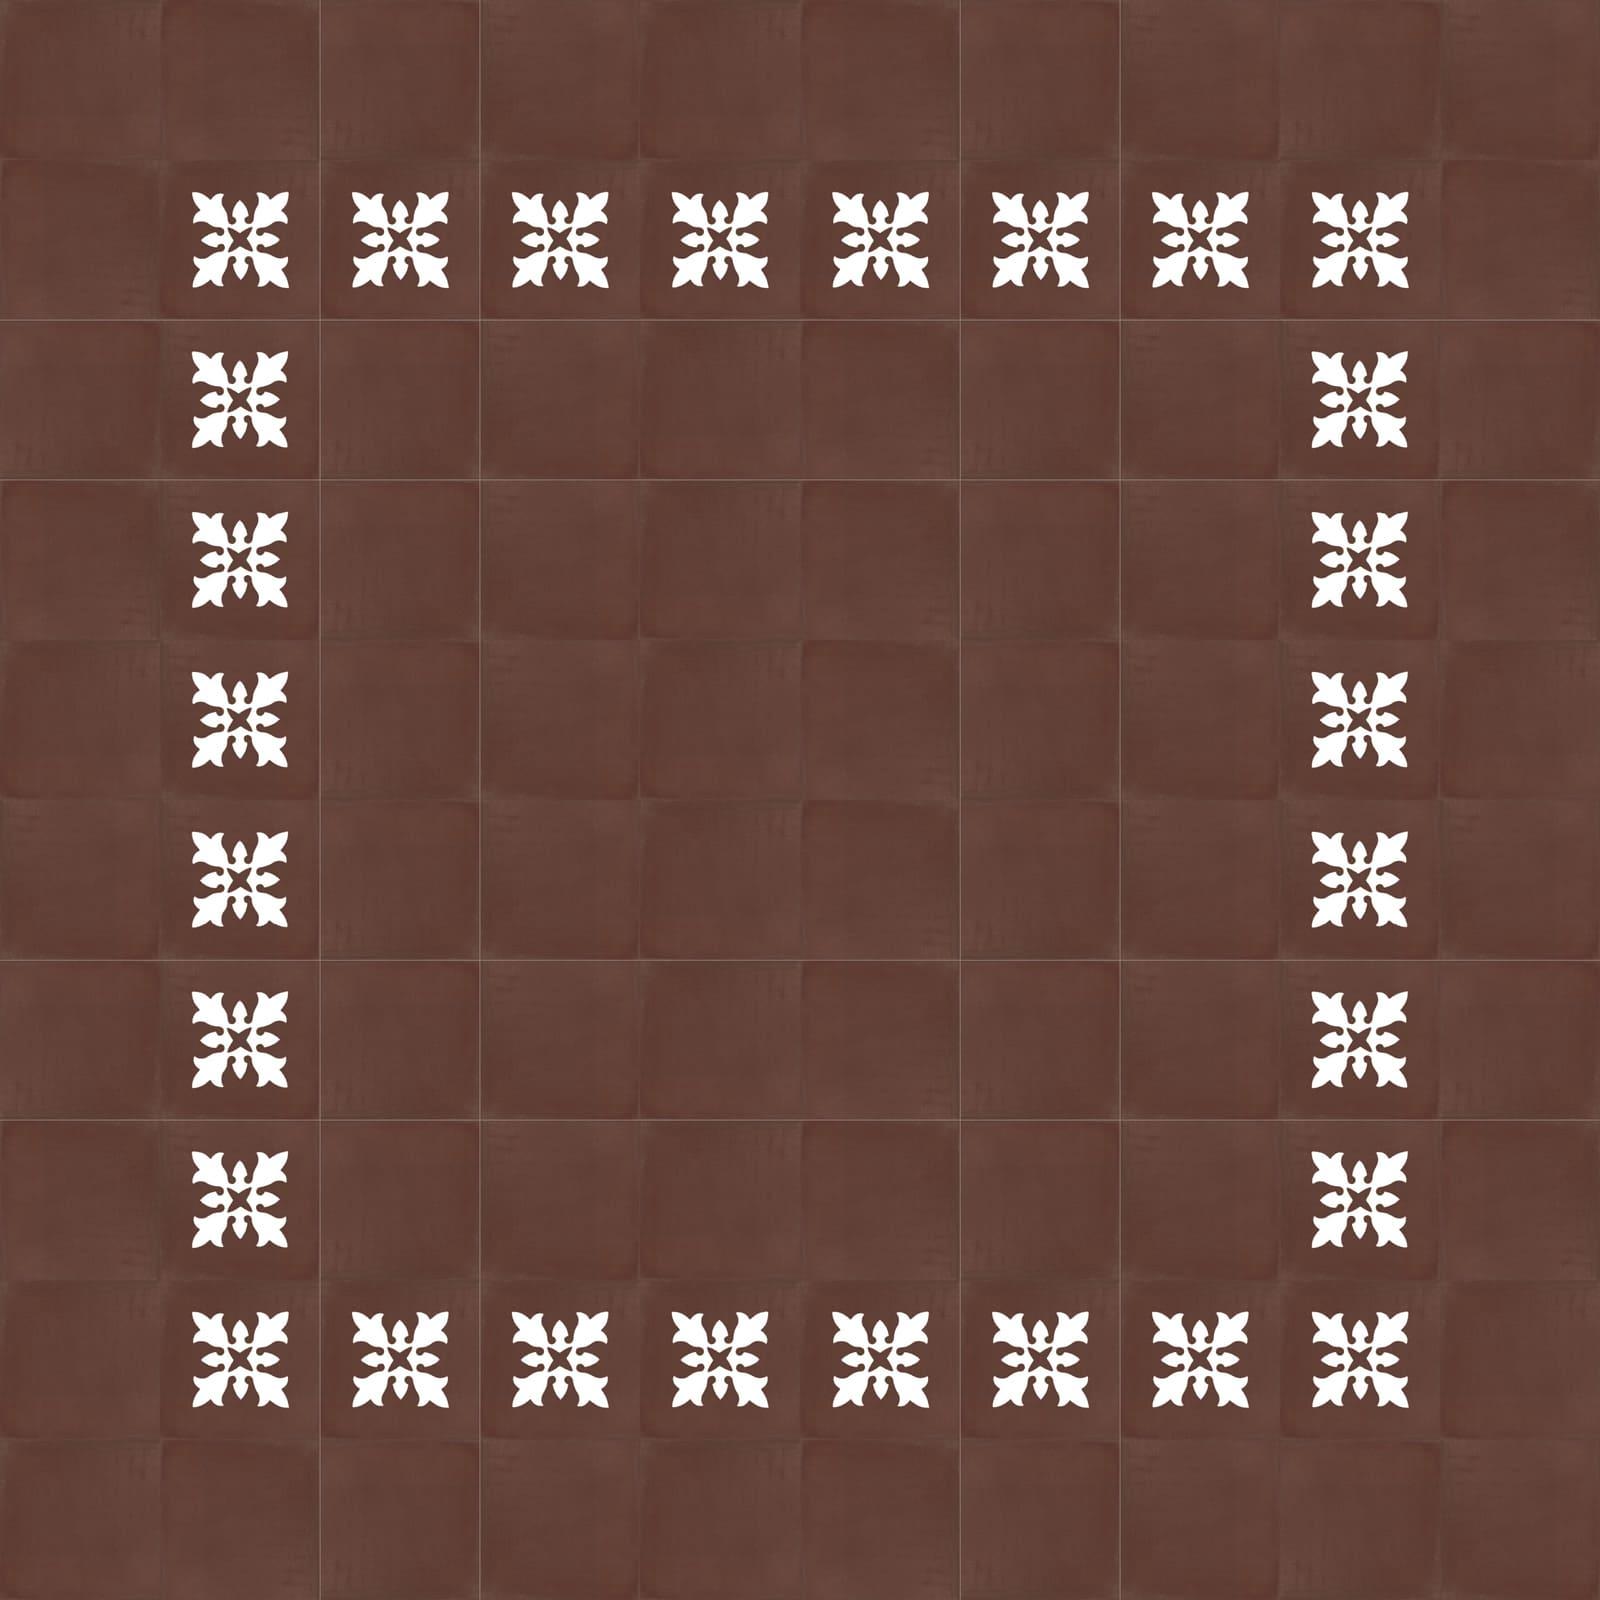 zementfliesen-verlegemuster-nummer-10934-viaplatten | 10934